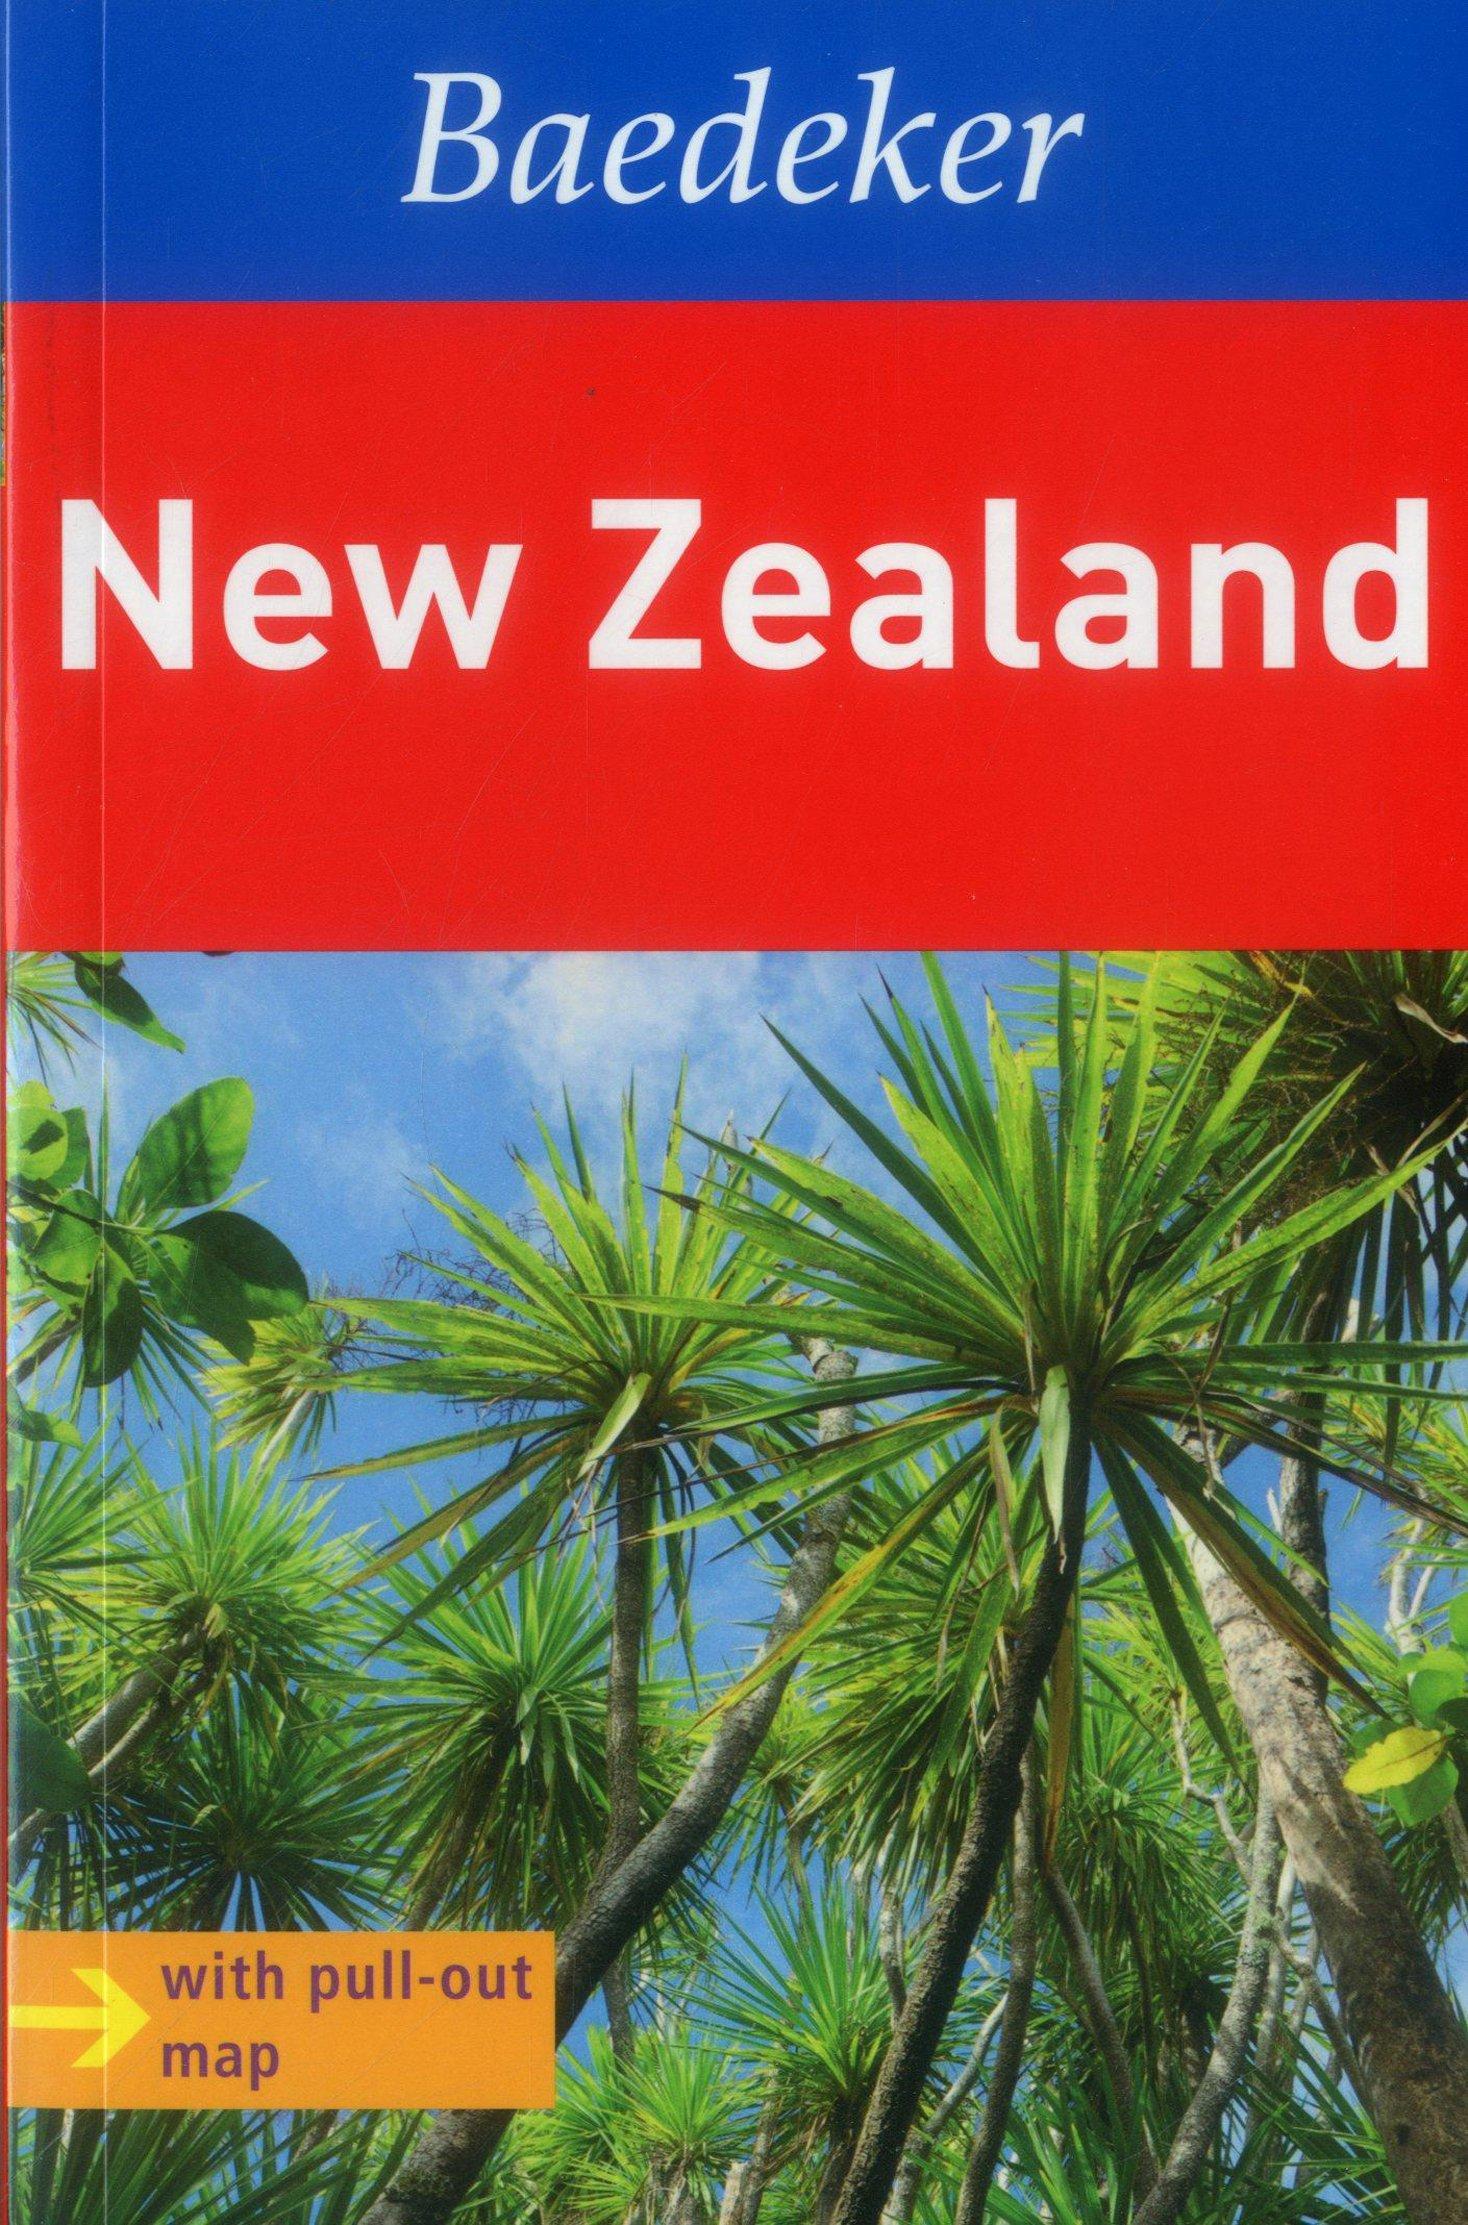 New Zealand Baedeker Guide (Baedeker Guides) ebook